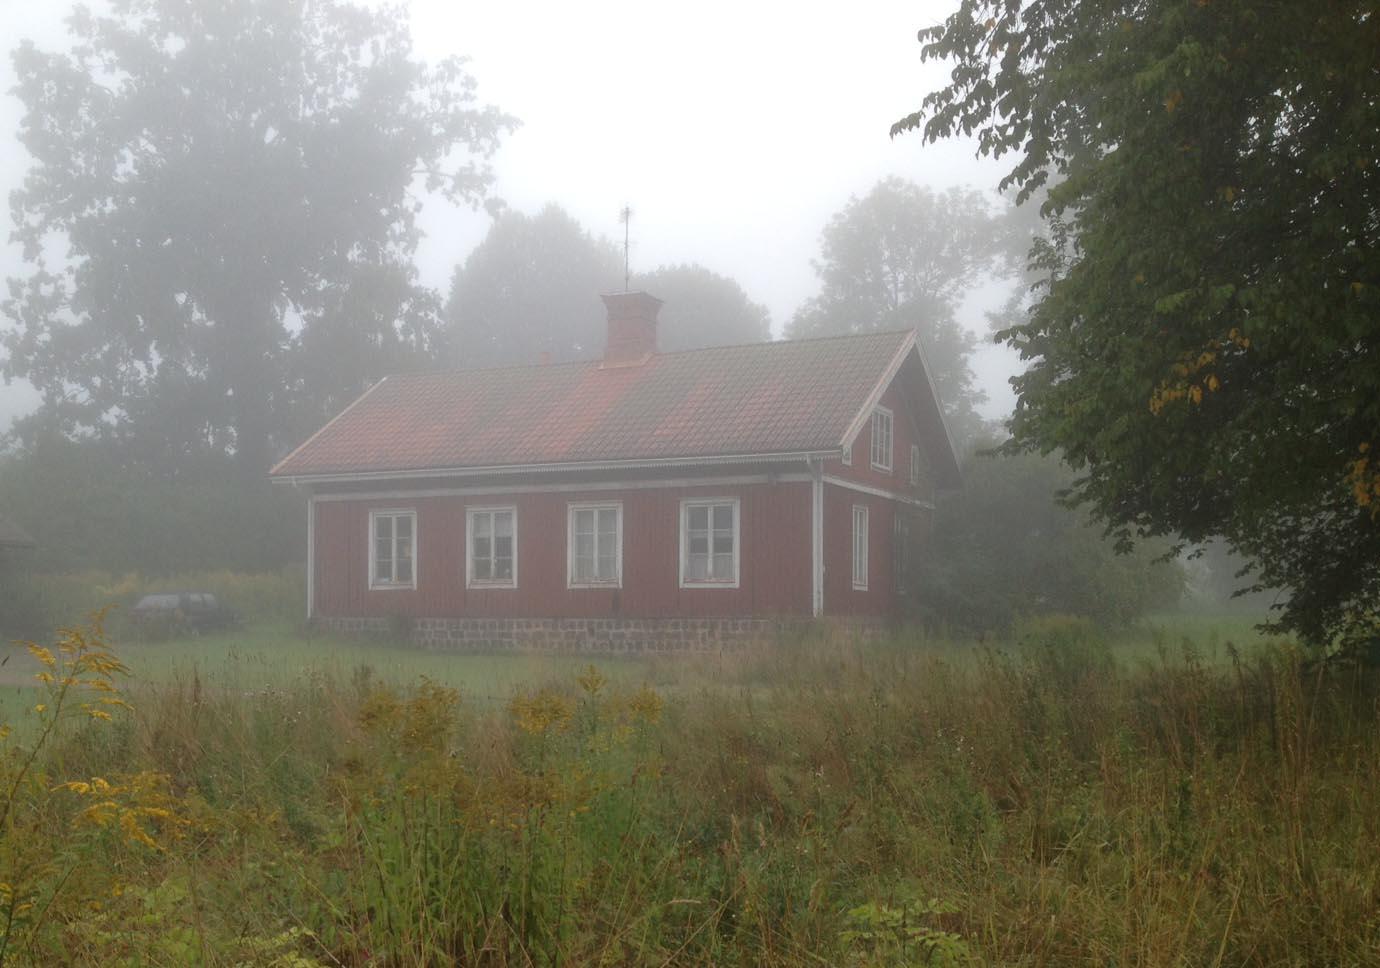 verkstad i dimma